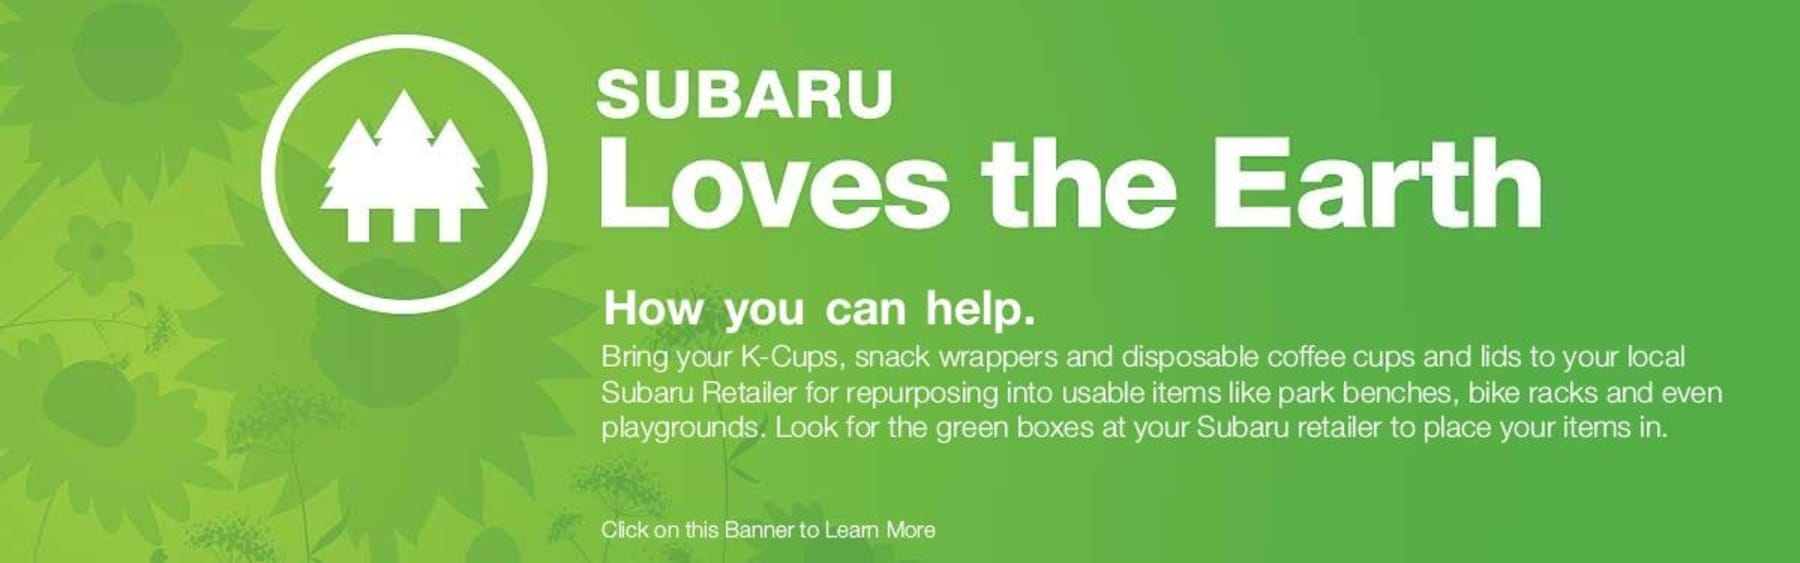 Used Car Dealerships Idaho Falls >> Wackerli Subaru in Idaho Falls, ID